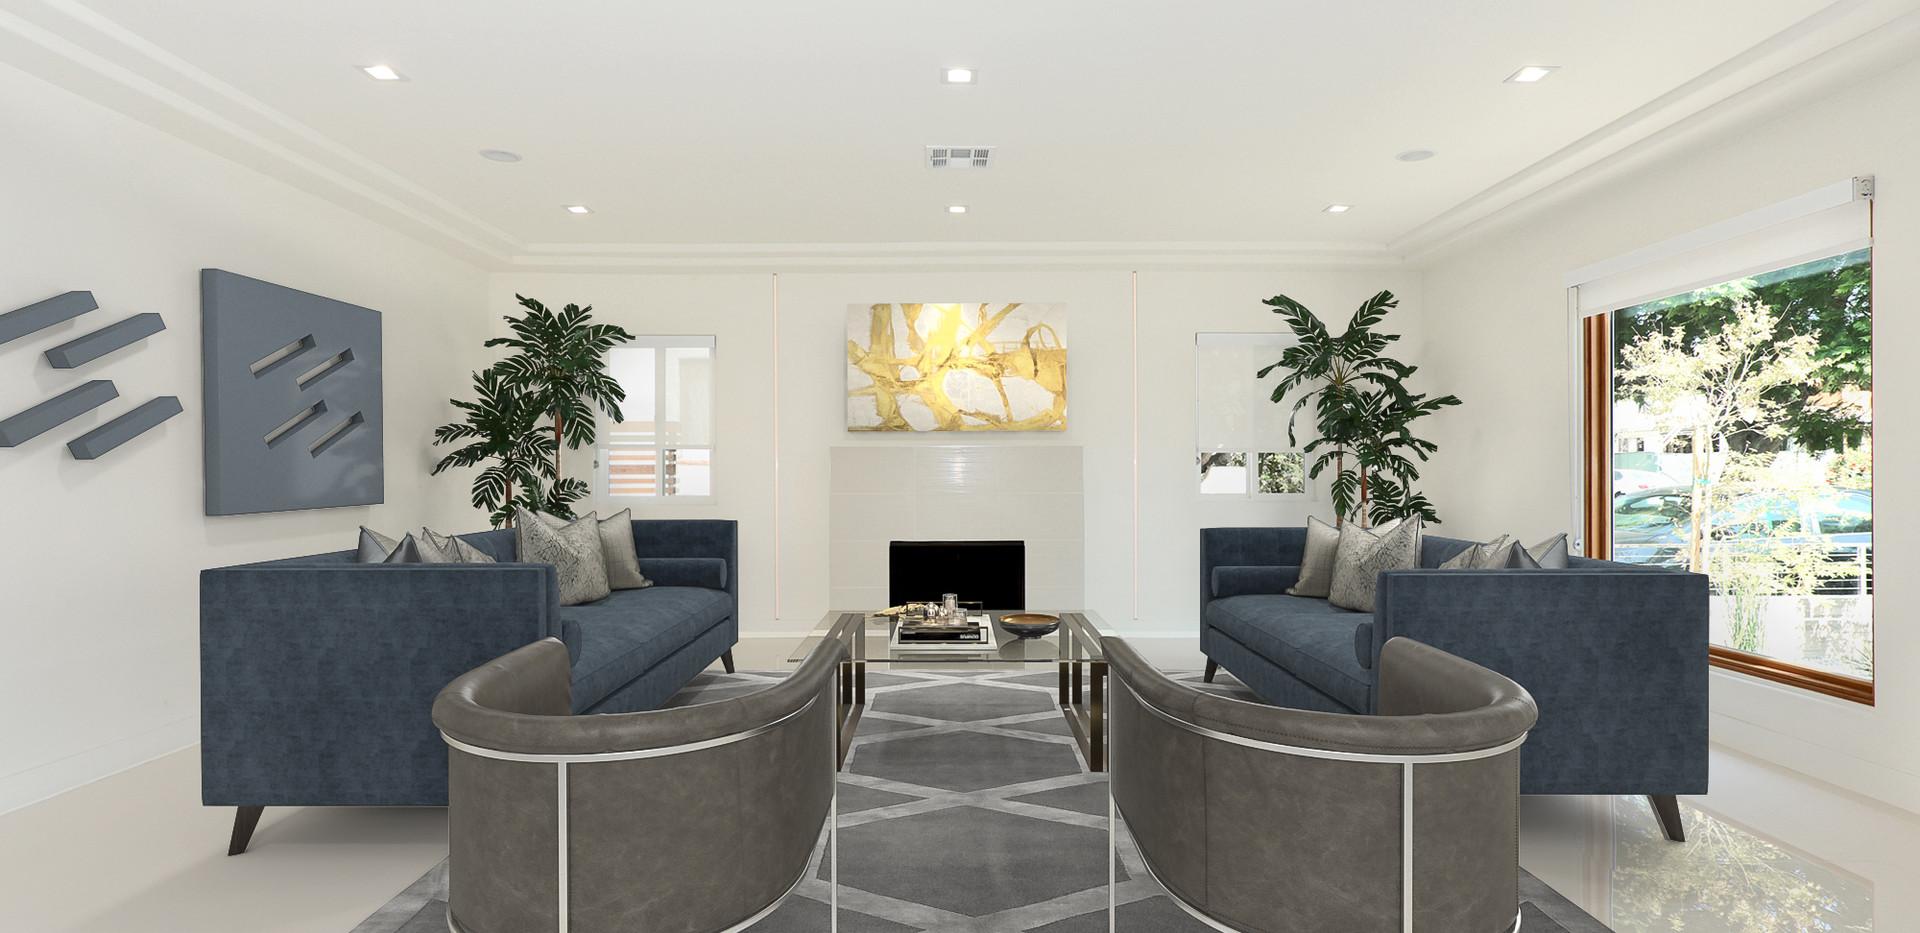 Living Room Staged v2.jpg